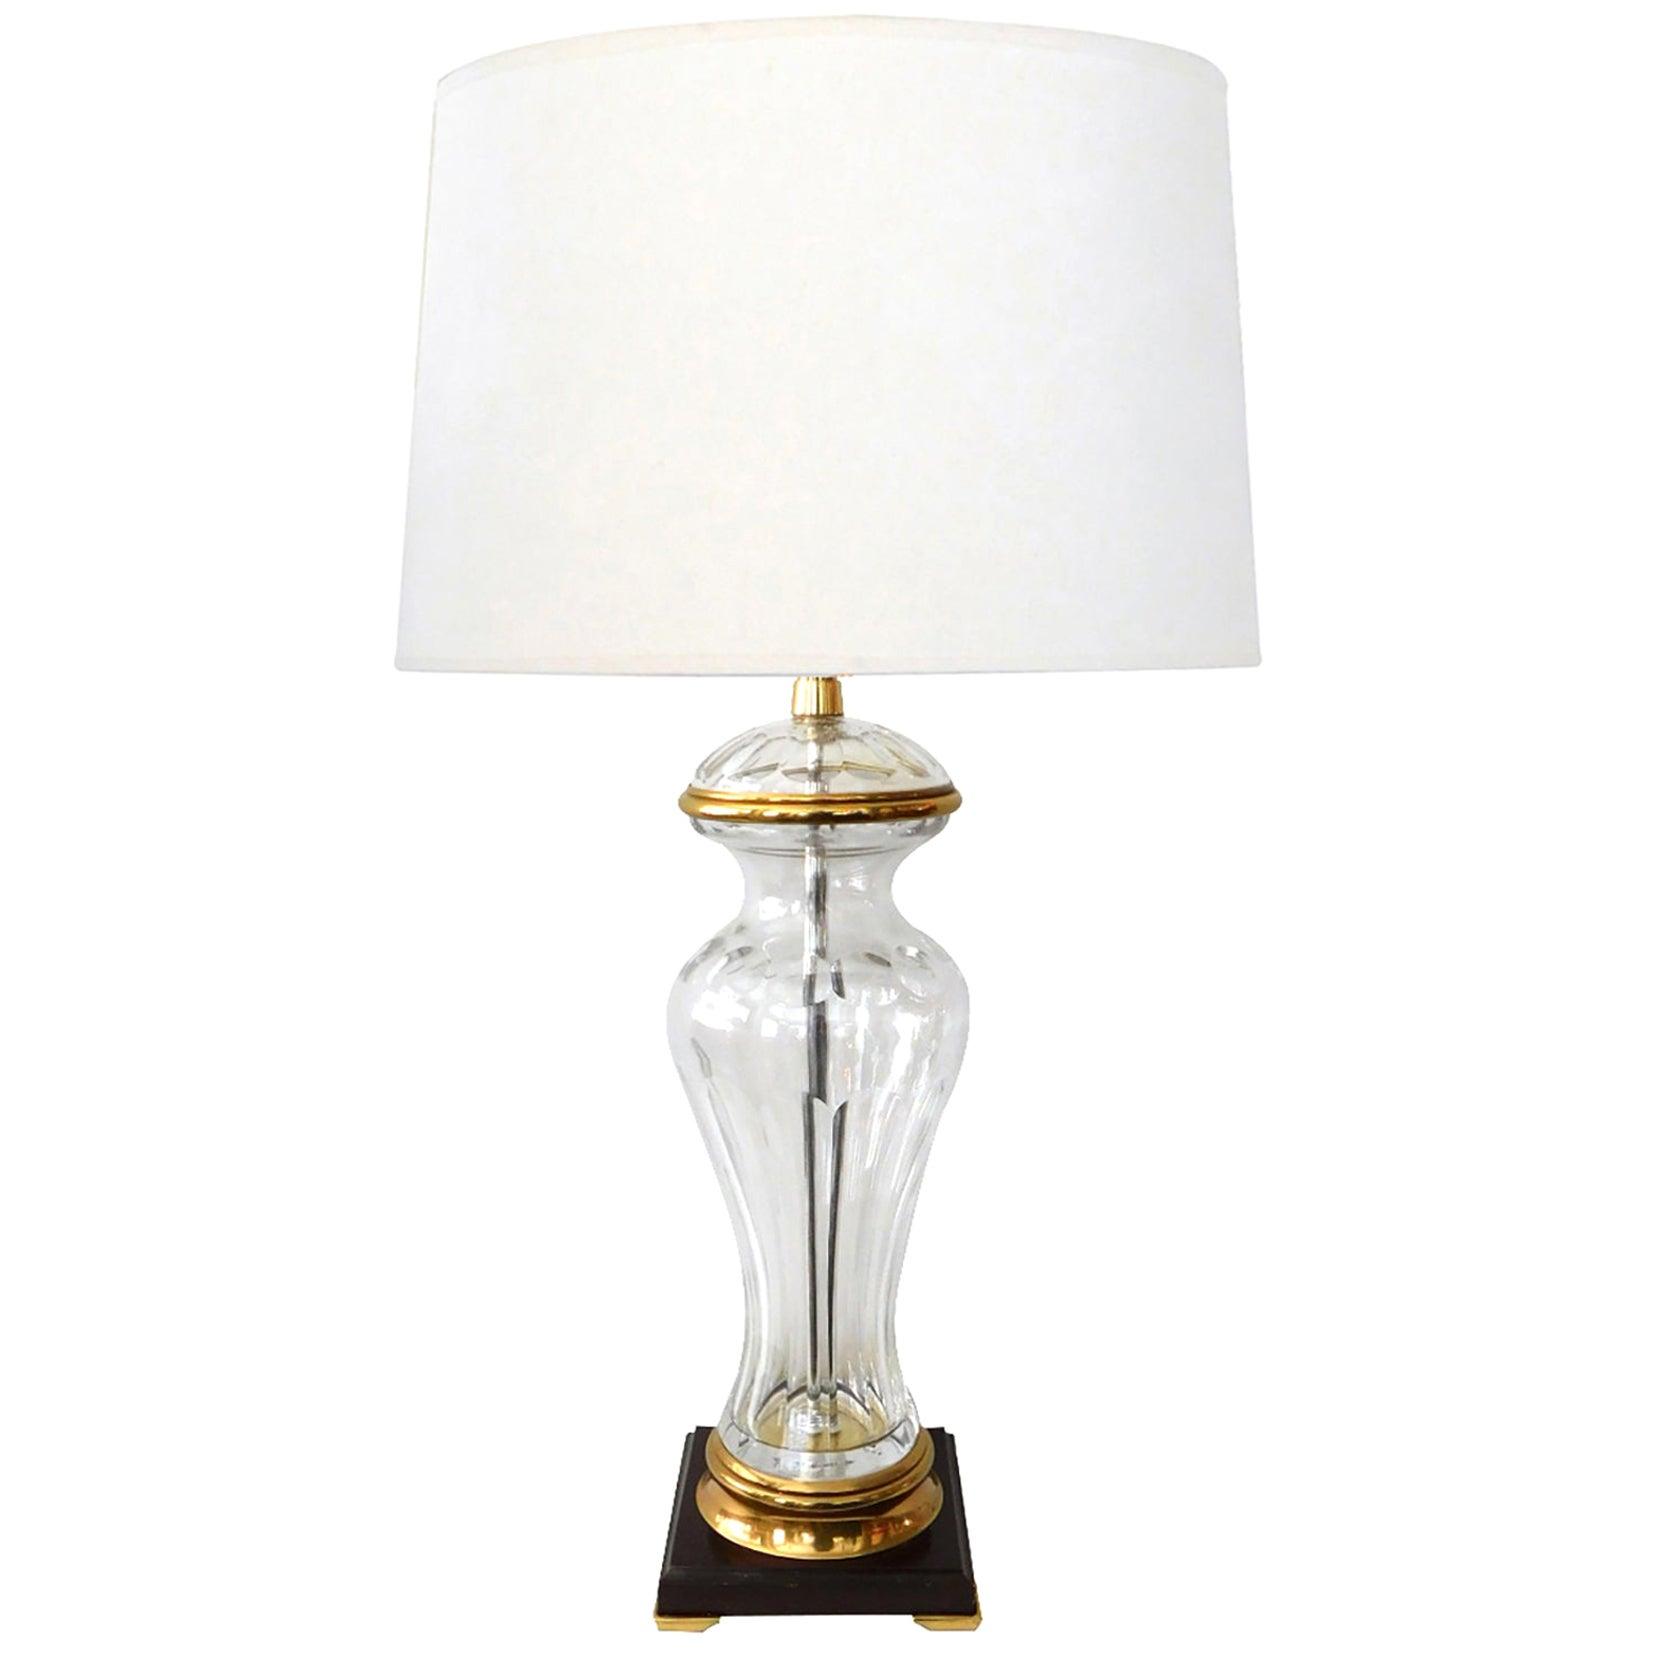 Large Marbro Lamp Co. 1960s Cut Crystal Baluster-Form Lamp with Gilt-Metal Moun